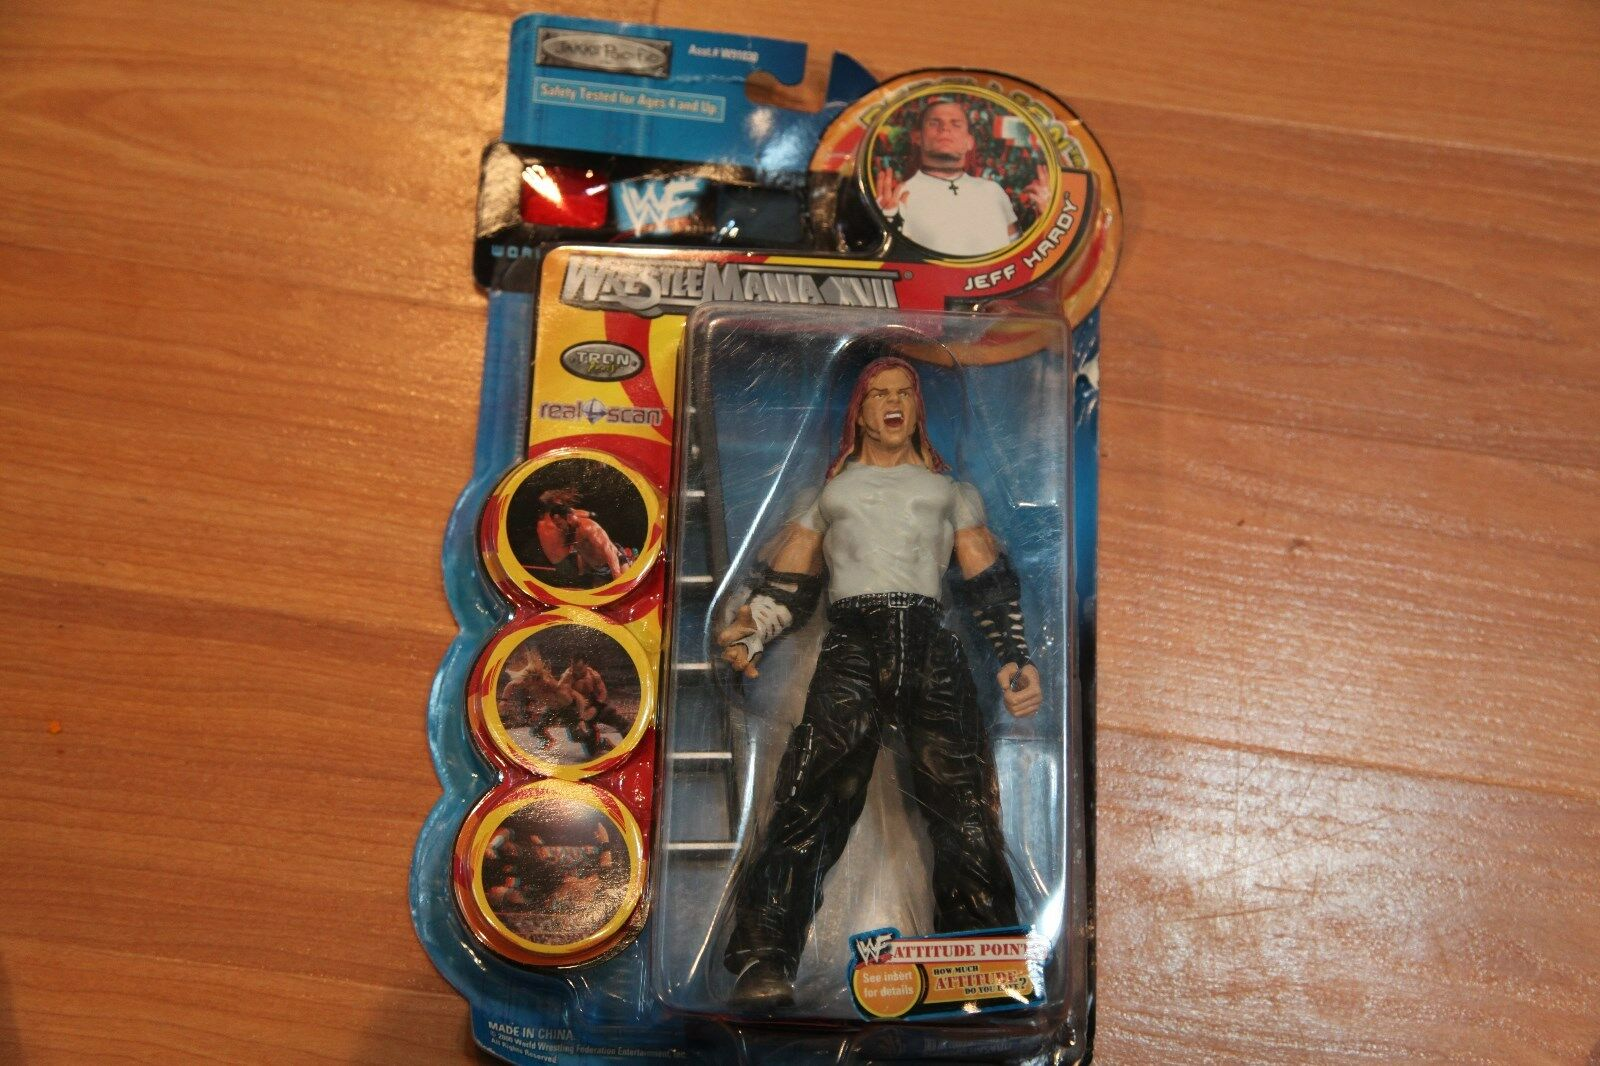 WWE WWF Jakks JEFF HARDY Action Figure Wrestlemania XVII Rebellion FREE SHIPPING